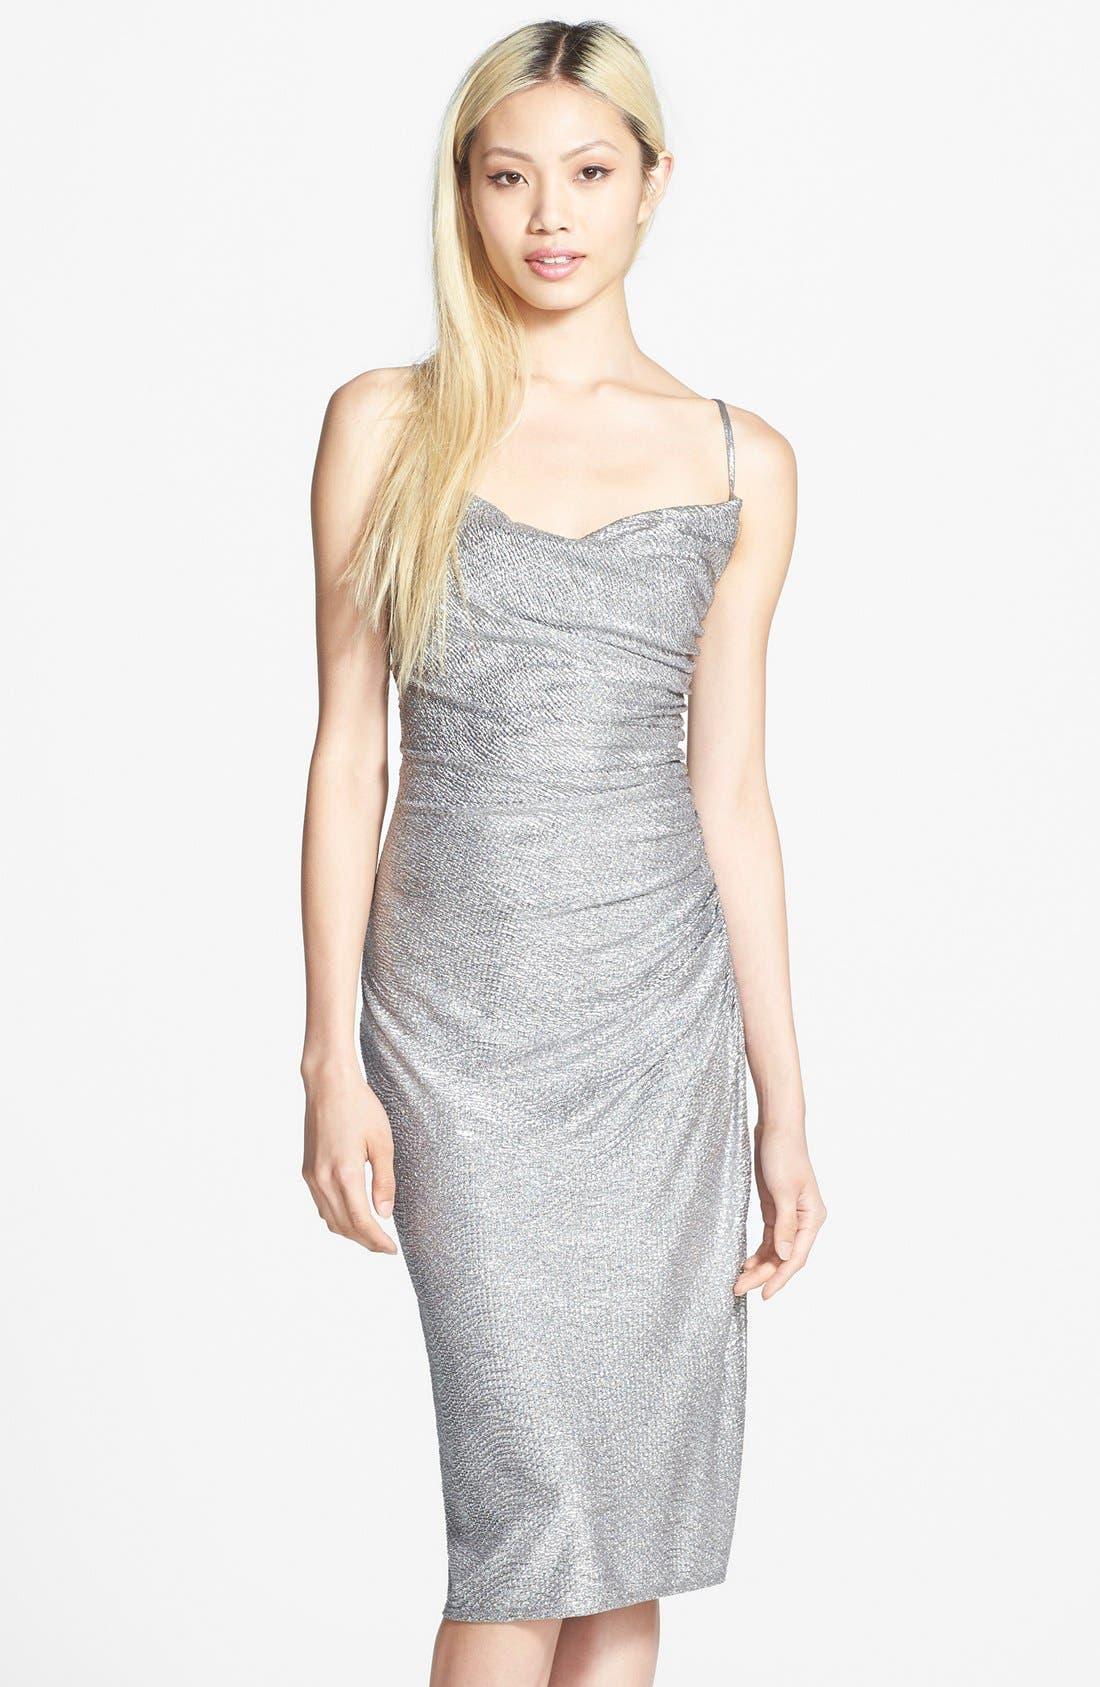 Alternate Image 1 Selected - Laundry by Shelli Segal Metallic Shirred Dress